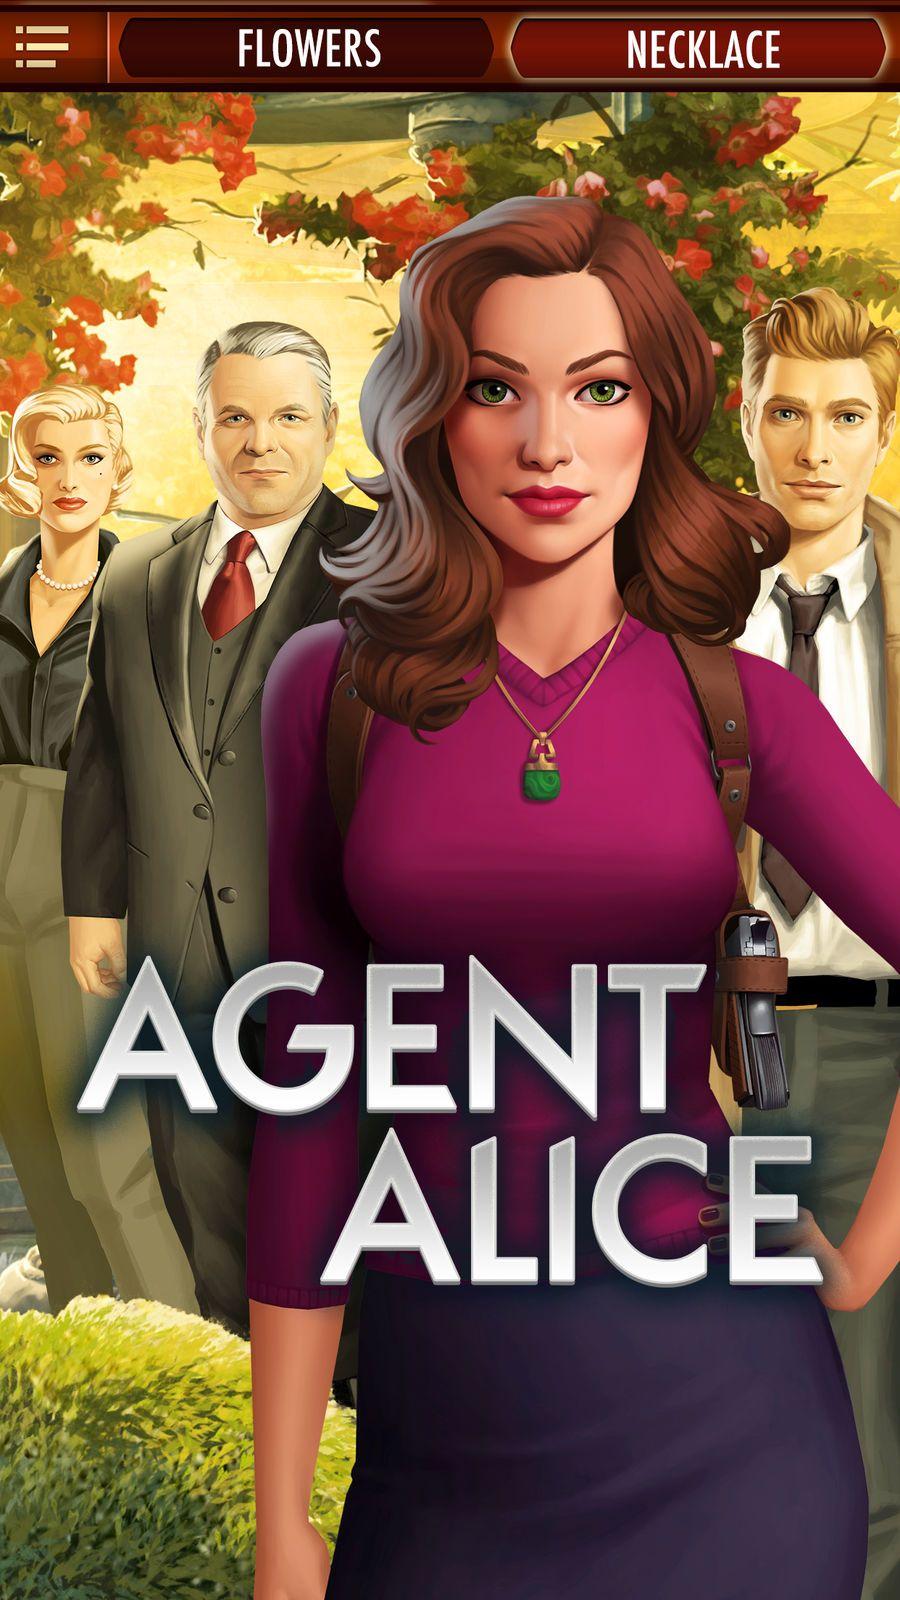 Agent Alice AdventurePuzzleappsios Alice, App, The